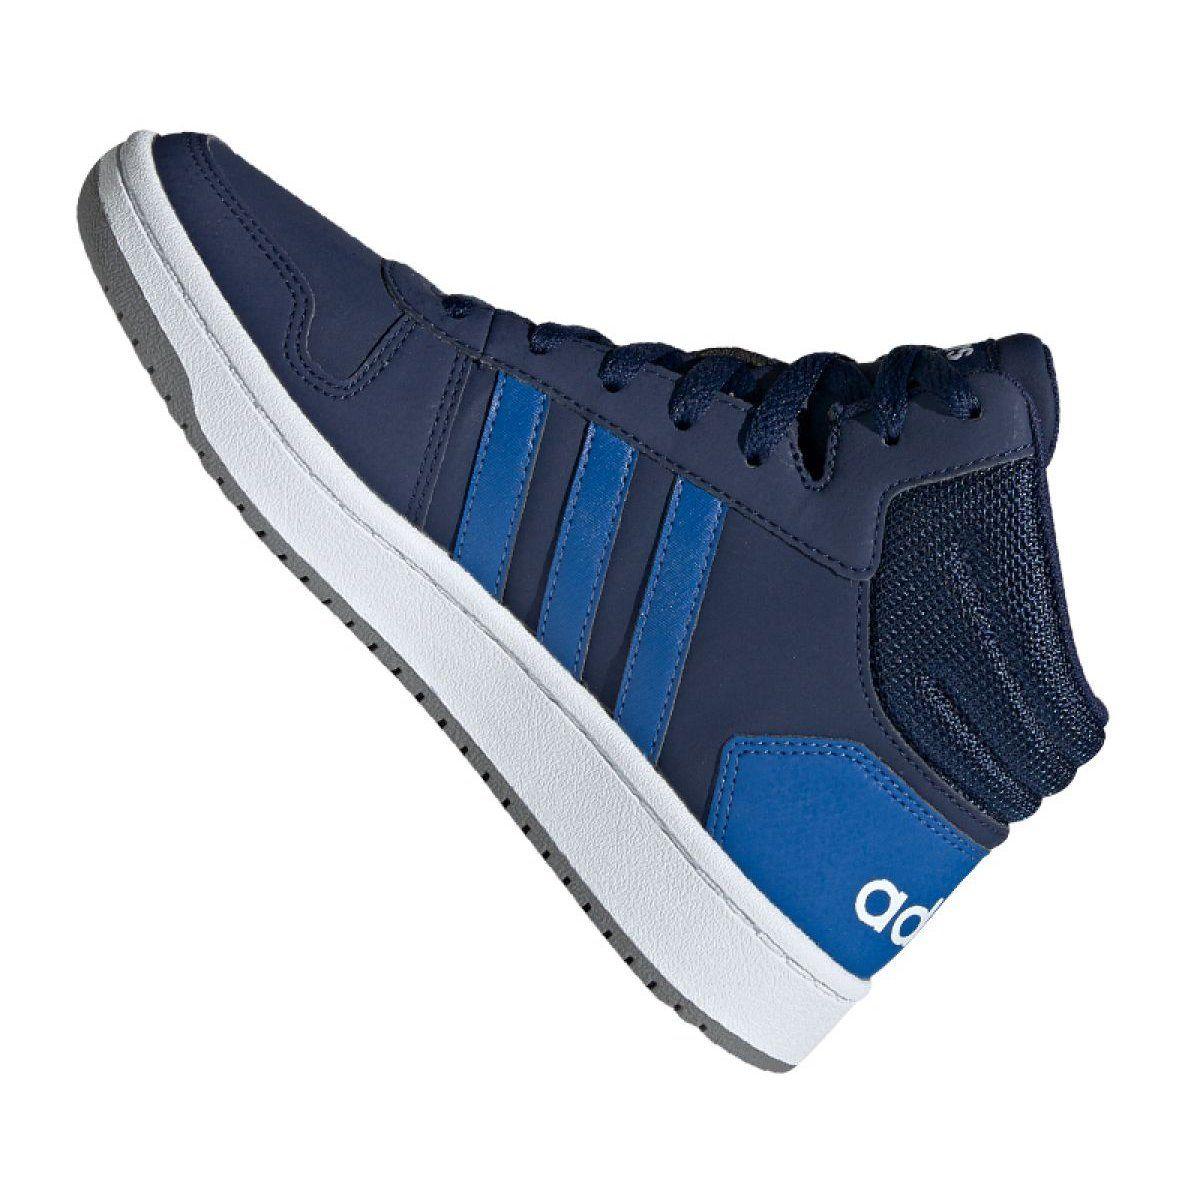 Sportowe #Damskie #Adidas #Granatowe #Buty #Adidas #Hoops